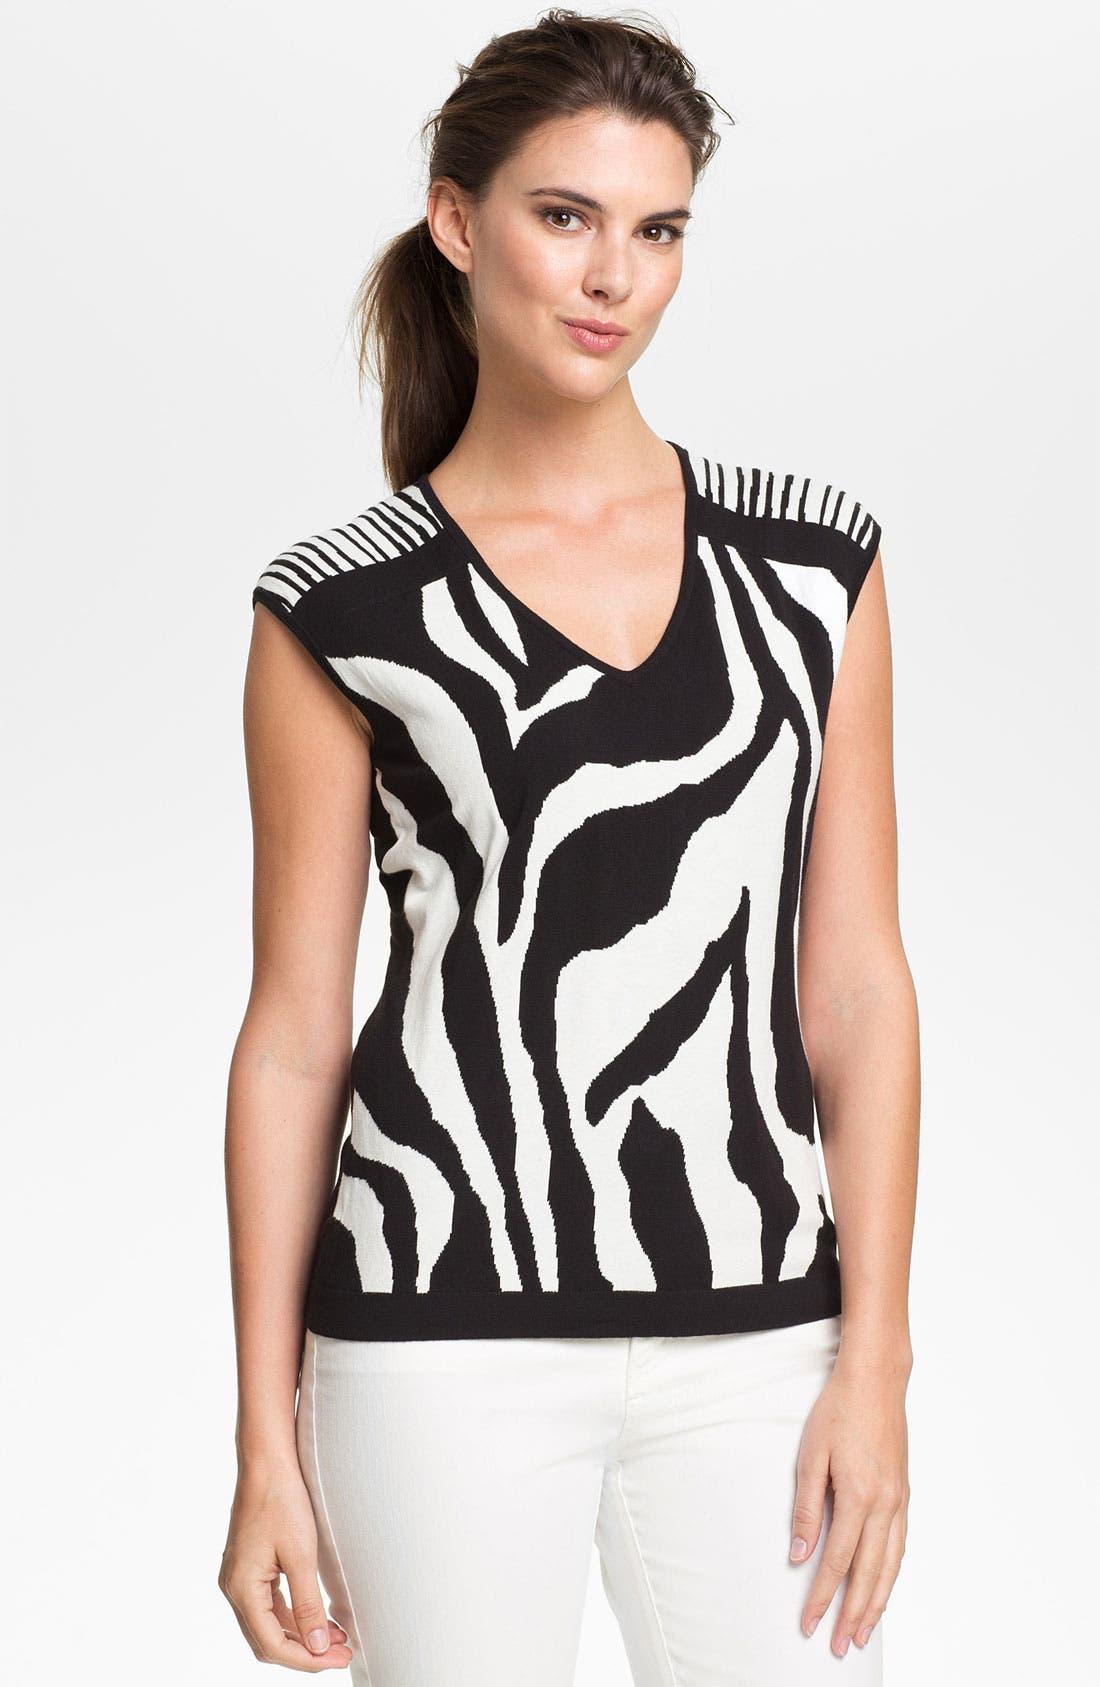 Alternate Image 1 Selected - Lafayette 148 New York Zebra Jacquard Sweater (Online Only)